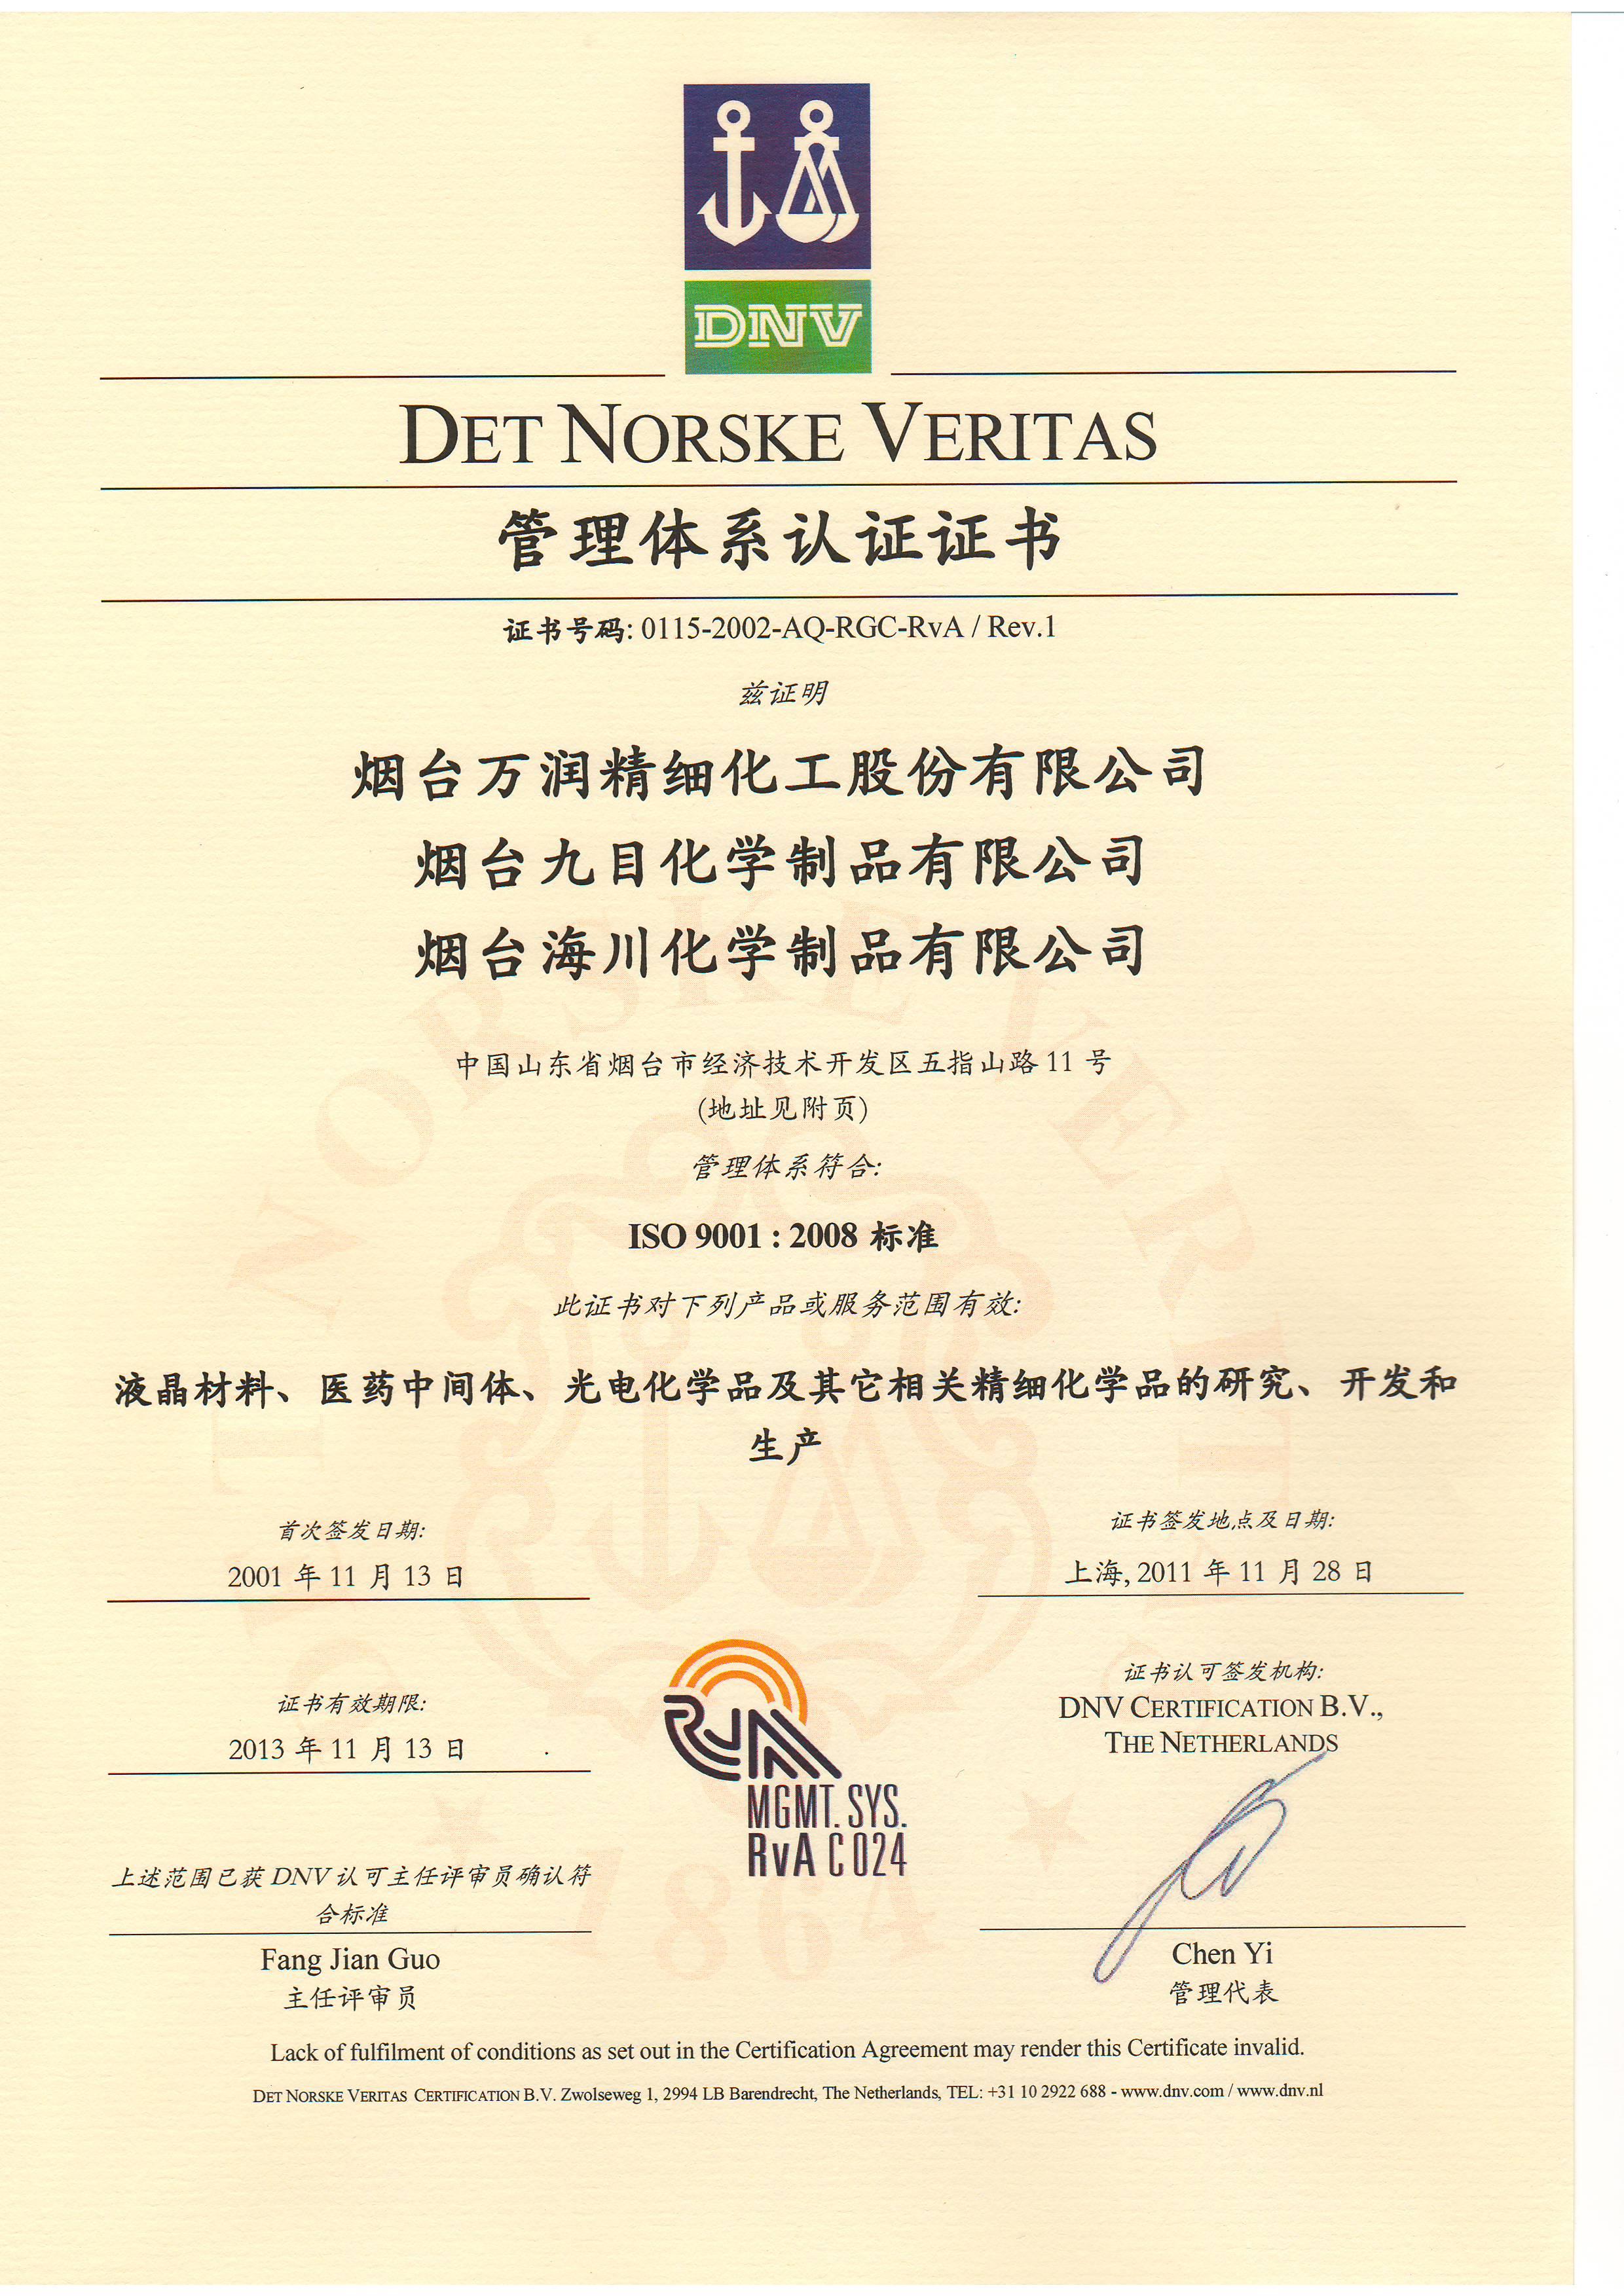 DNV 认证的ISO9001:2008质量体系认证